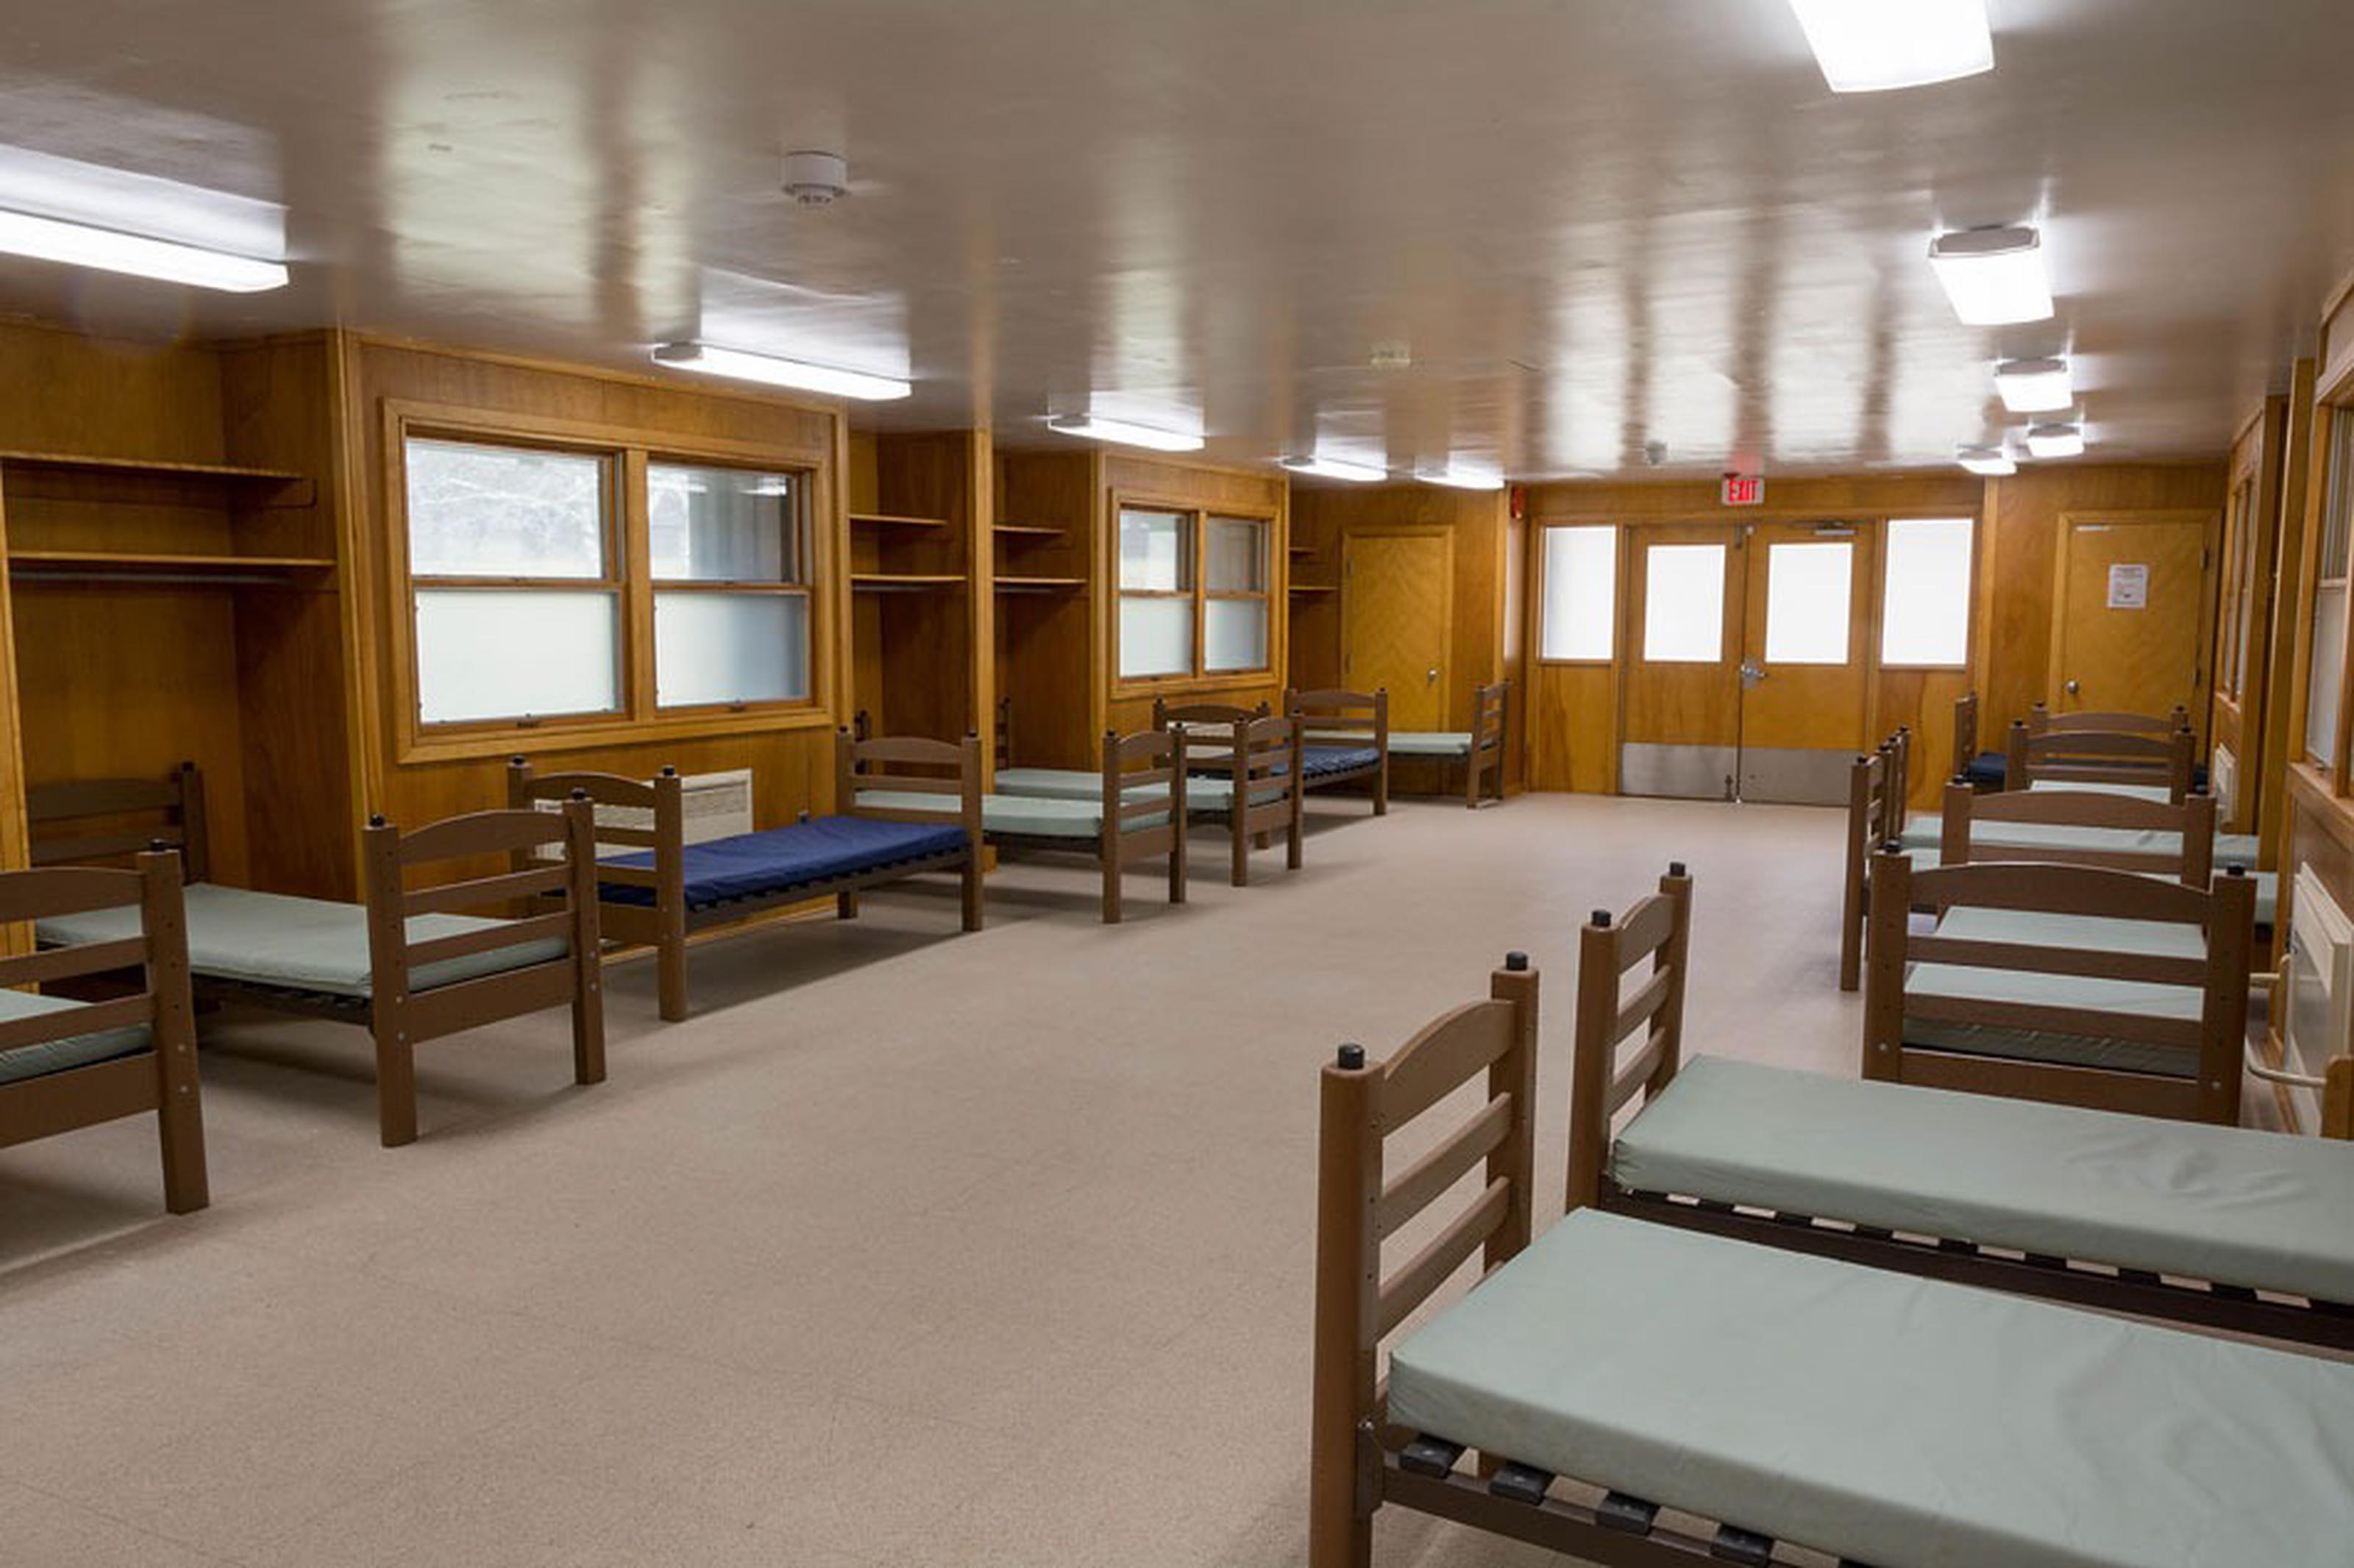 Camp Round Meadow DormEach dorm sleeps 30 people and has 2 bathrooms.